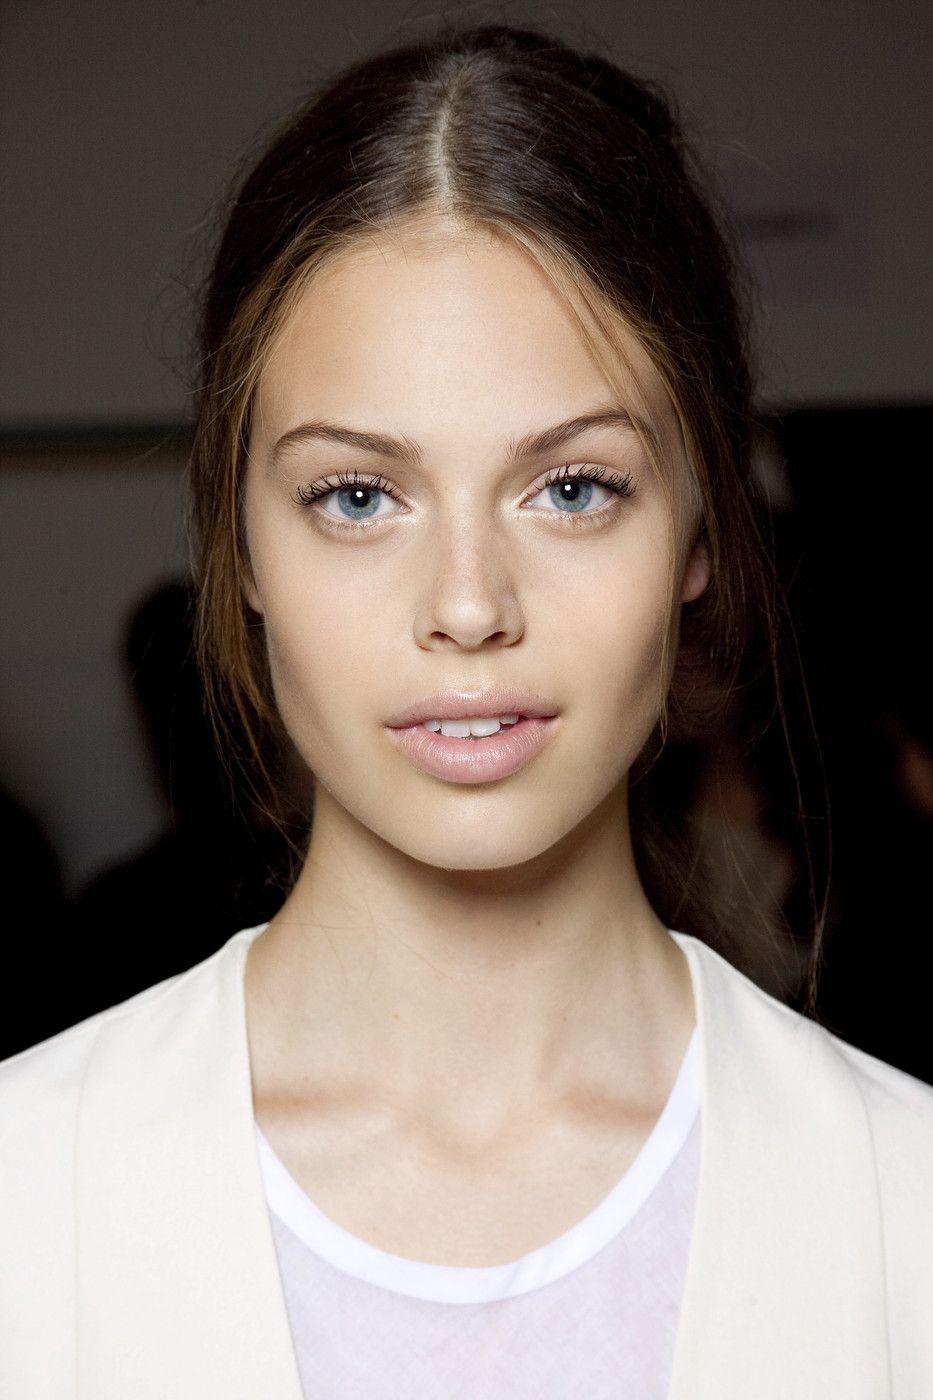 jessica clarke Victoria secret model Makeup and hair